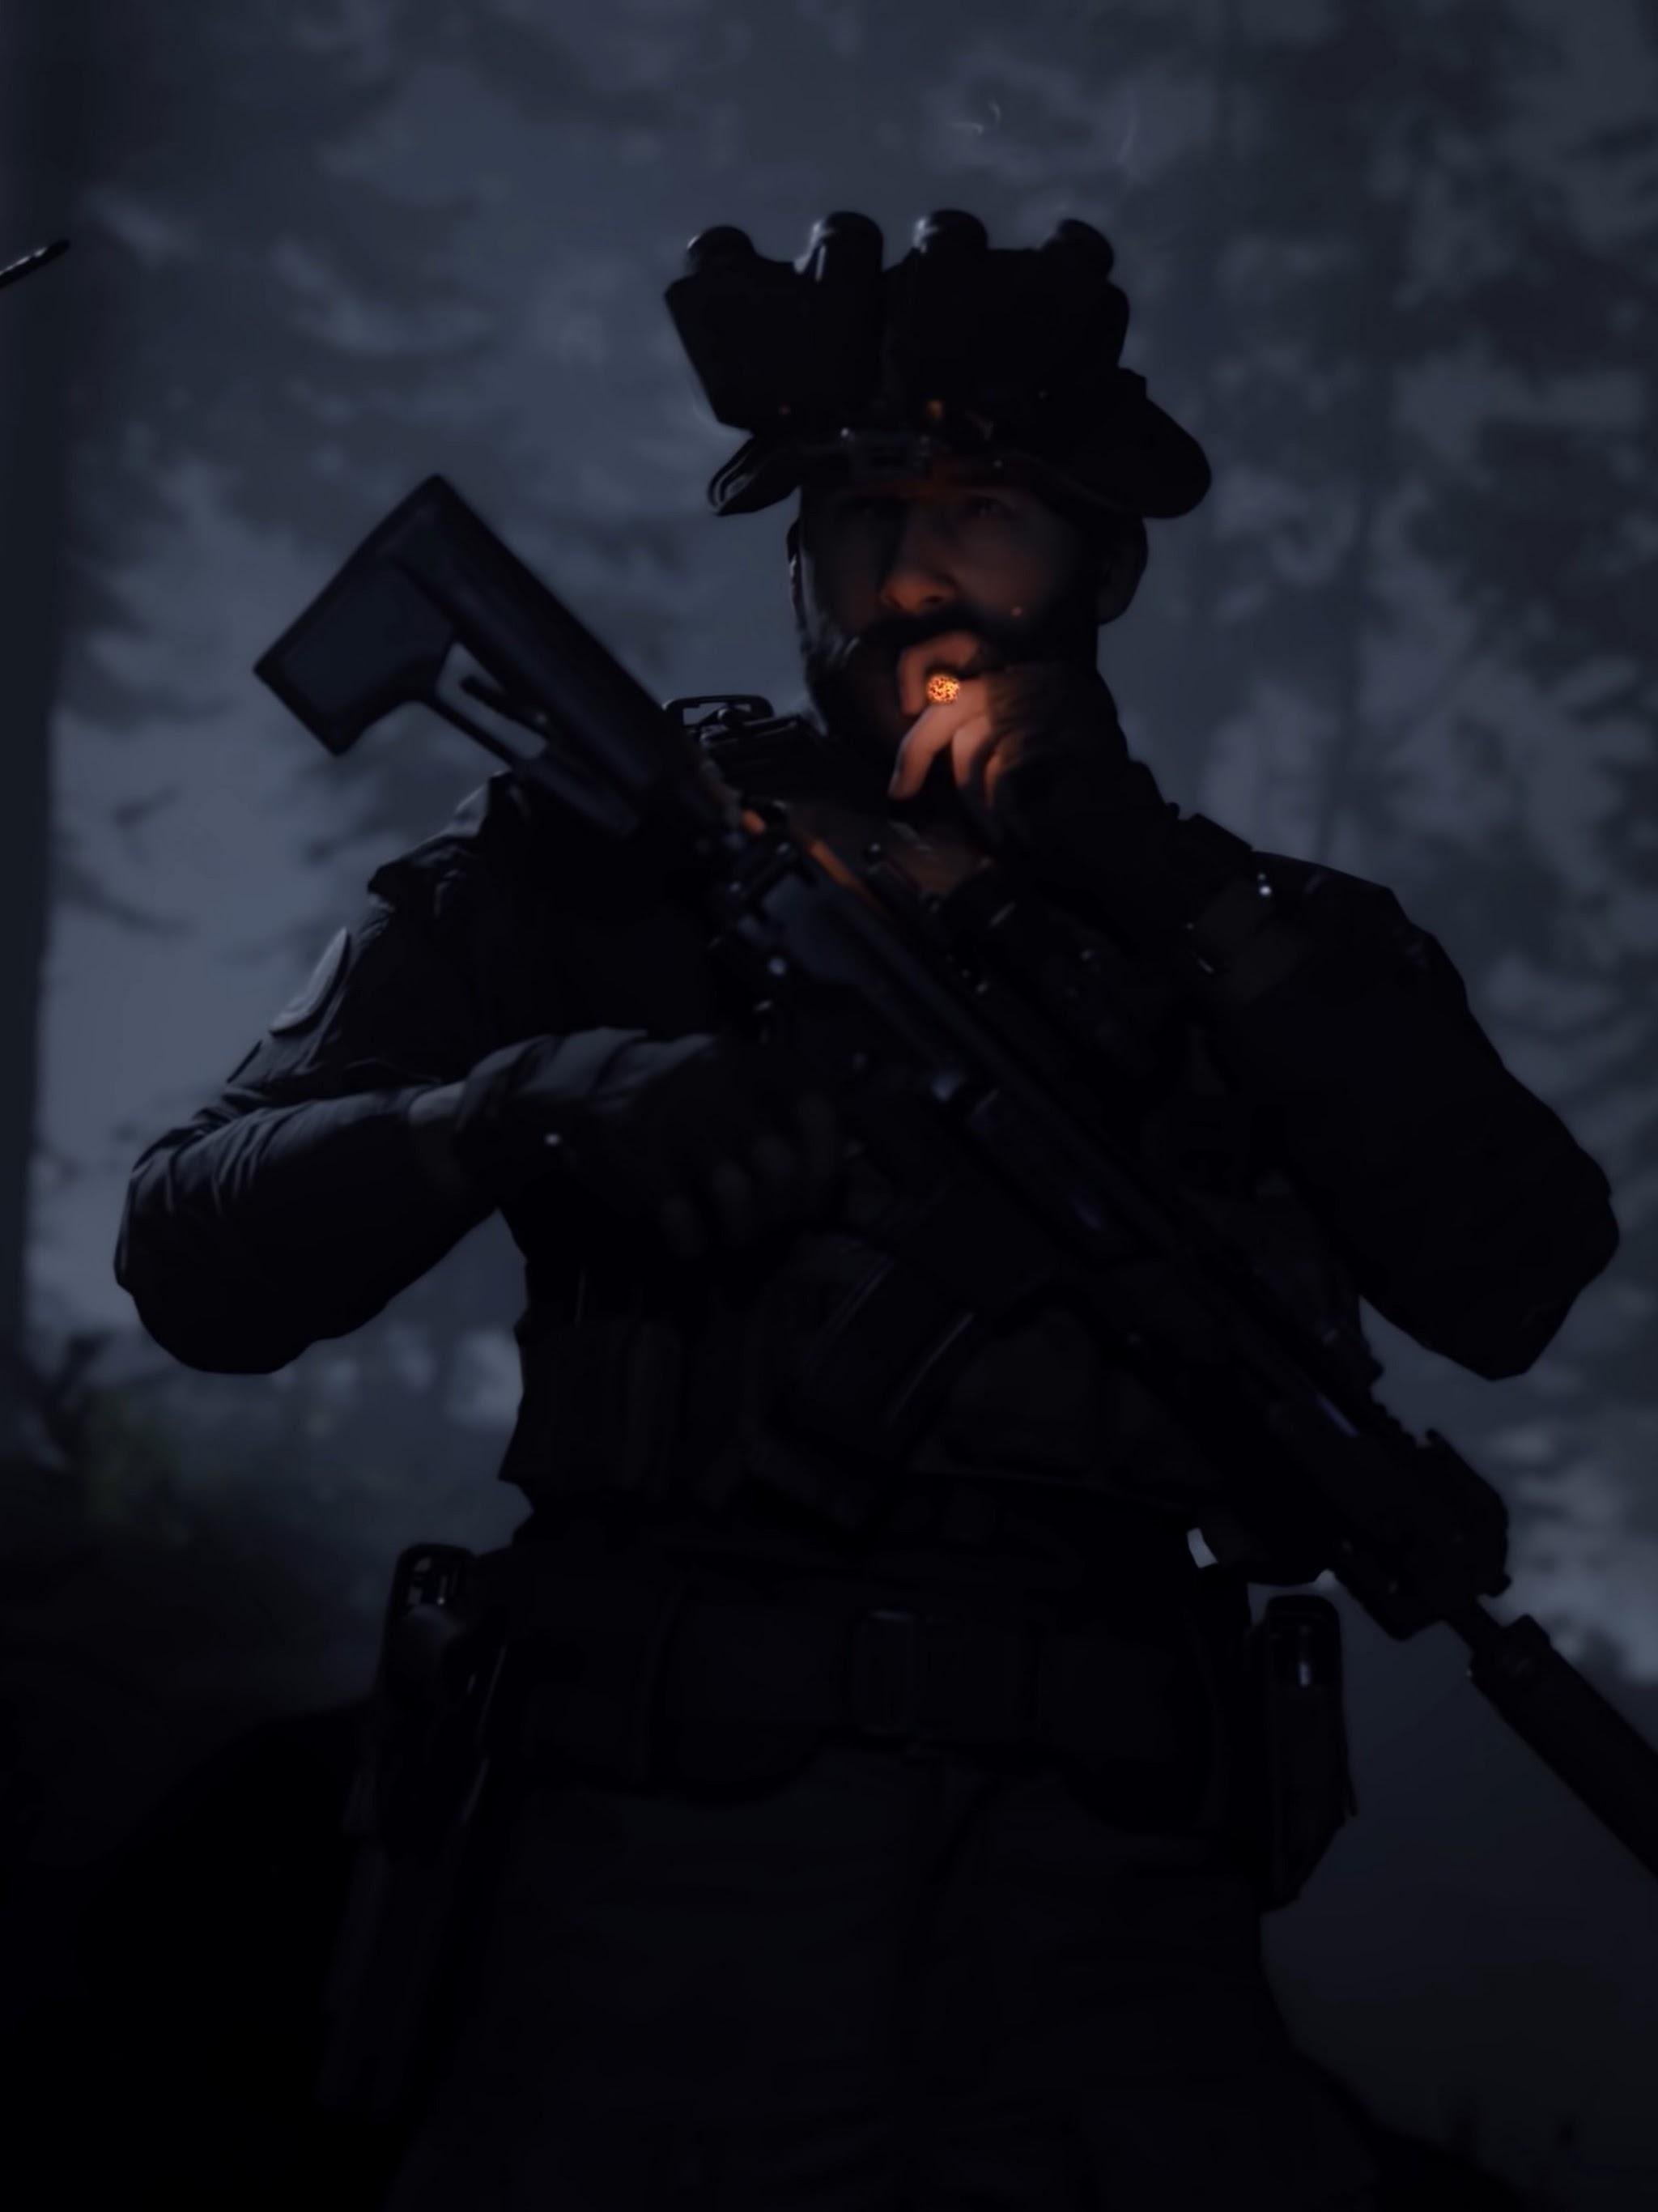 Call Of Duty Modern Warfare Captain Price Smoking 4k Wallpaper 5